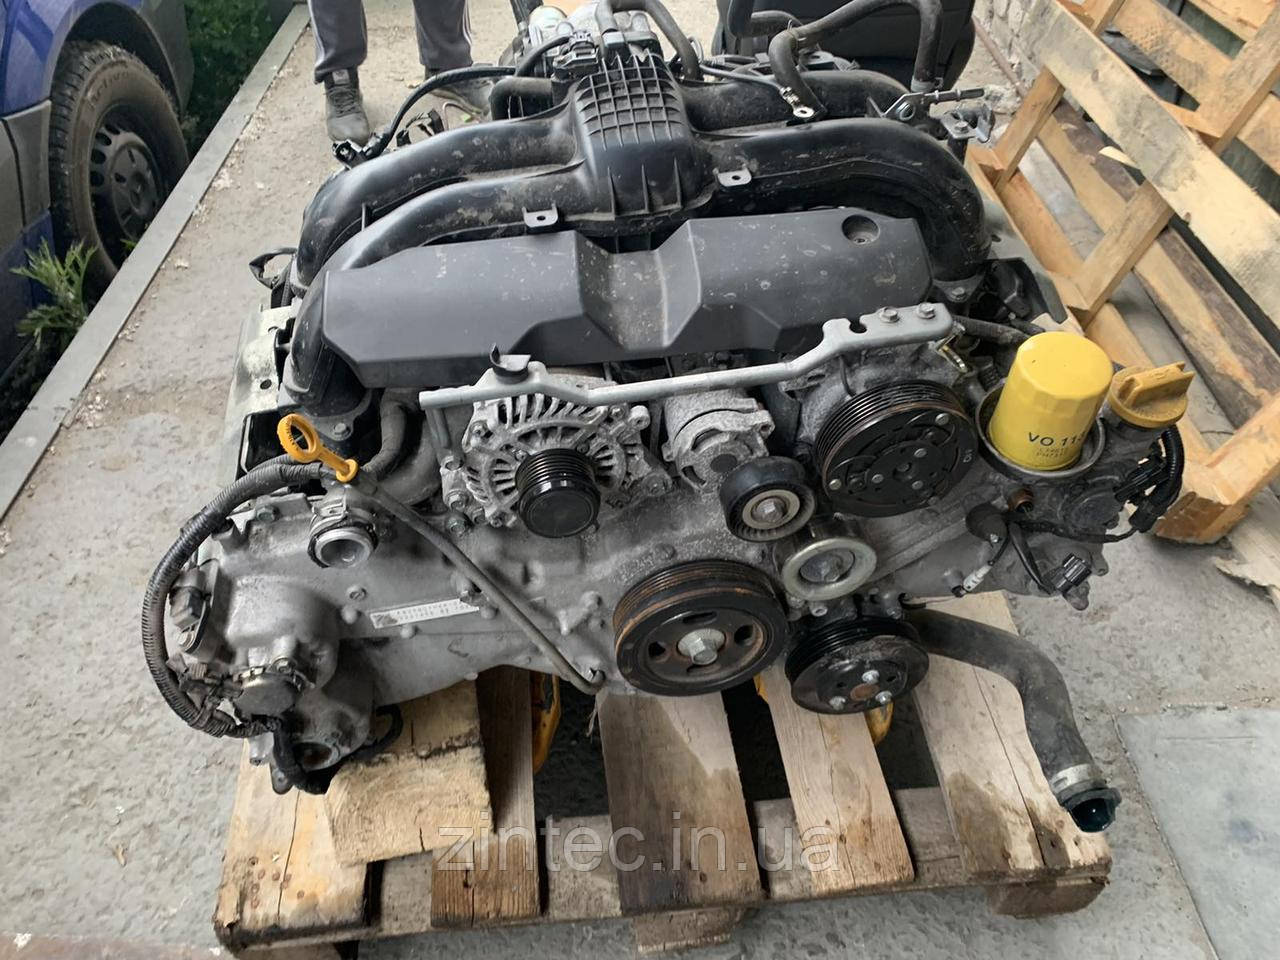 Двигатель Subaru Forester 2.5 USA 2017 год